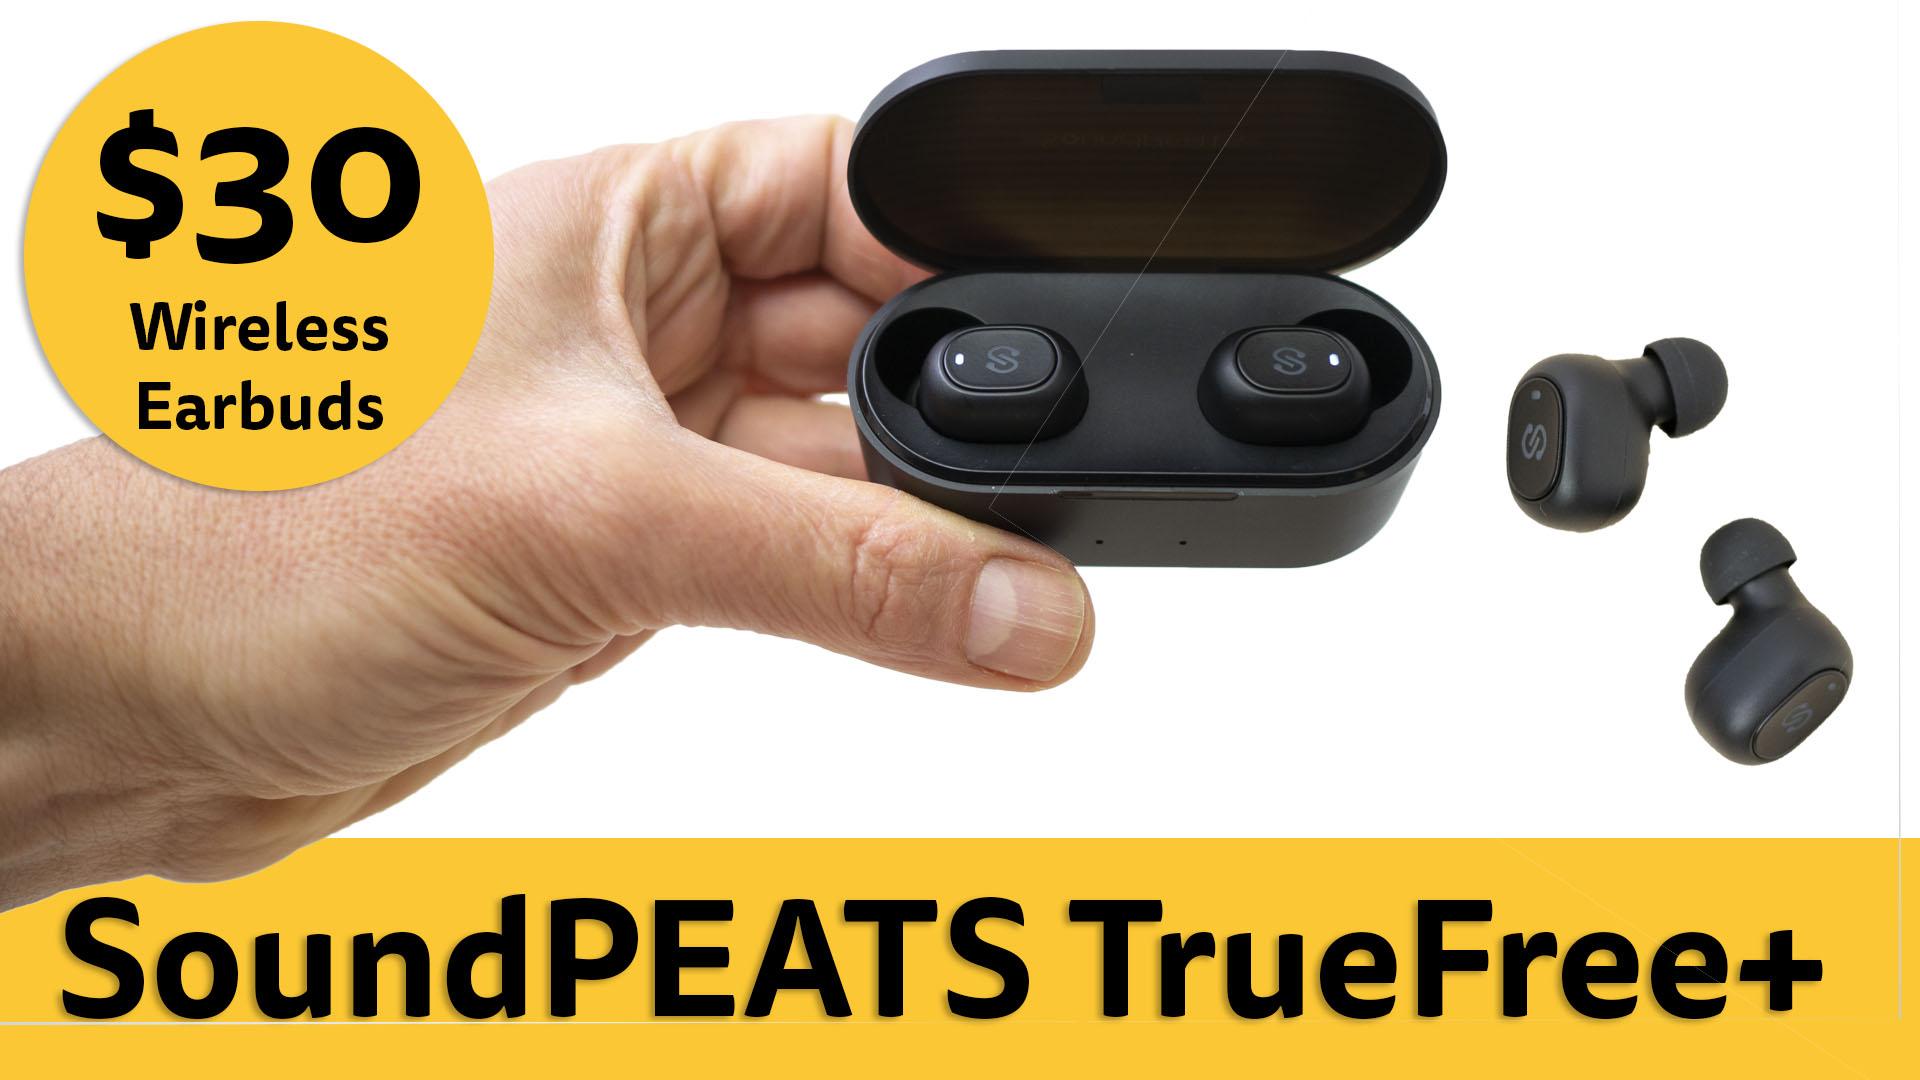 Budget true wireless earbuds $30/£30 | SoundPEATS TrueFree+ review